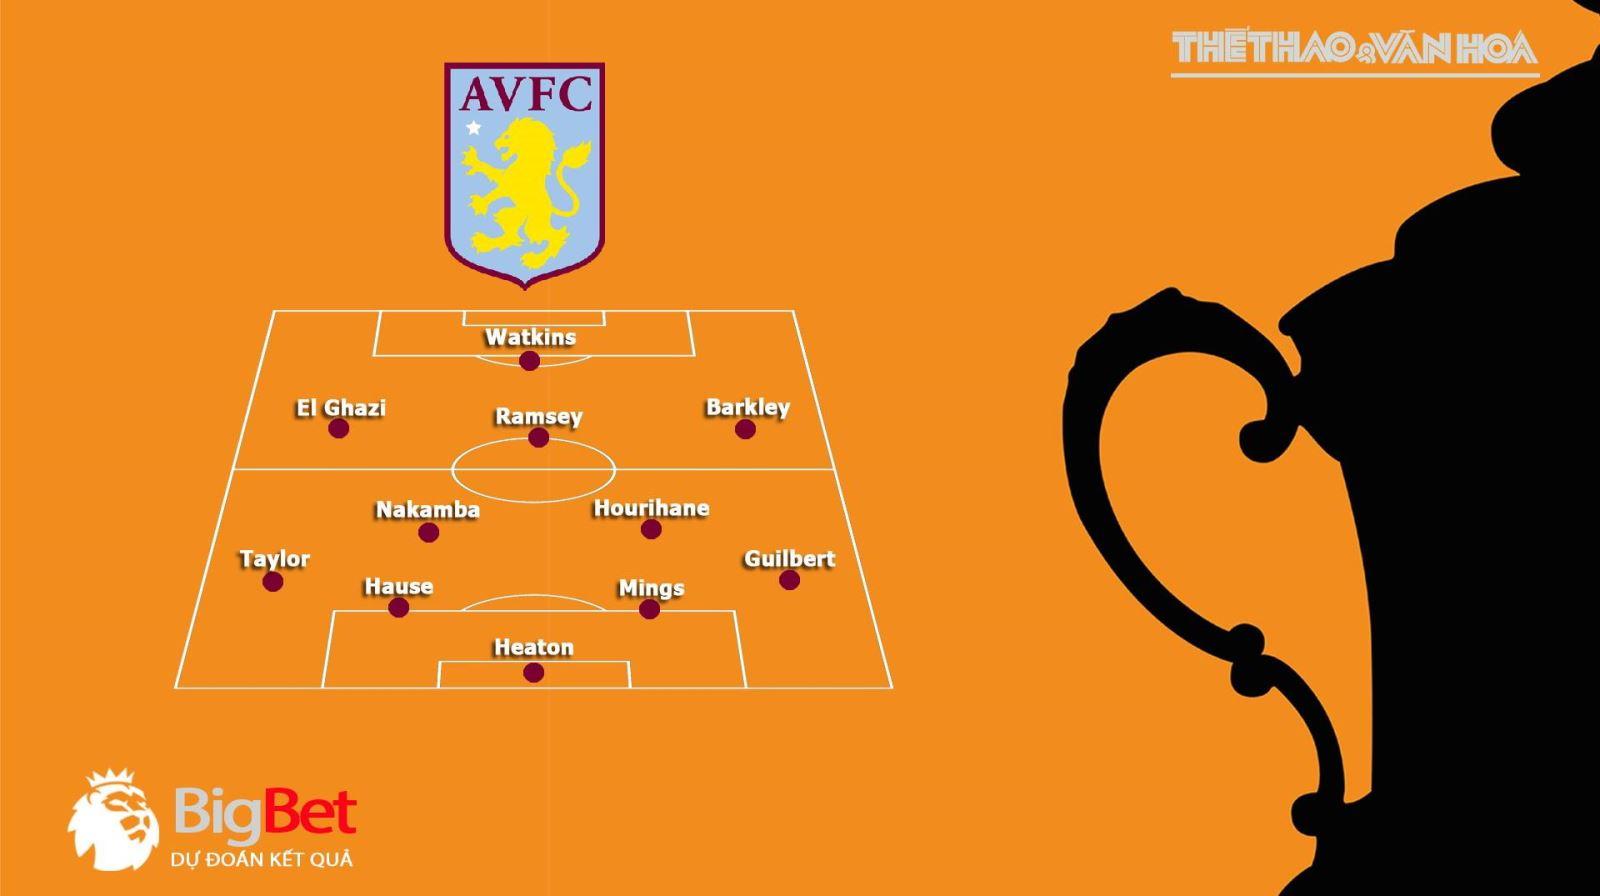 Link xem trực tiếp Aston Villa vs Liverpool. Trực tiếp Cúp FA. Trực tiếp FPT Play. Trực tiếp bóng đá. Trực tiếp Aston Villa đấu với Liverpool. Kèo bóng đáLiverpool